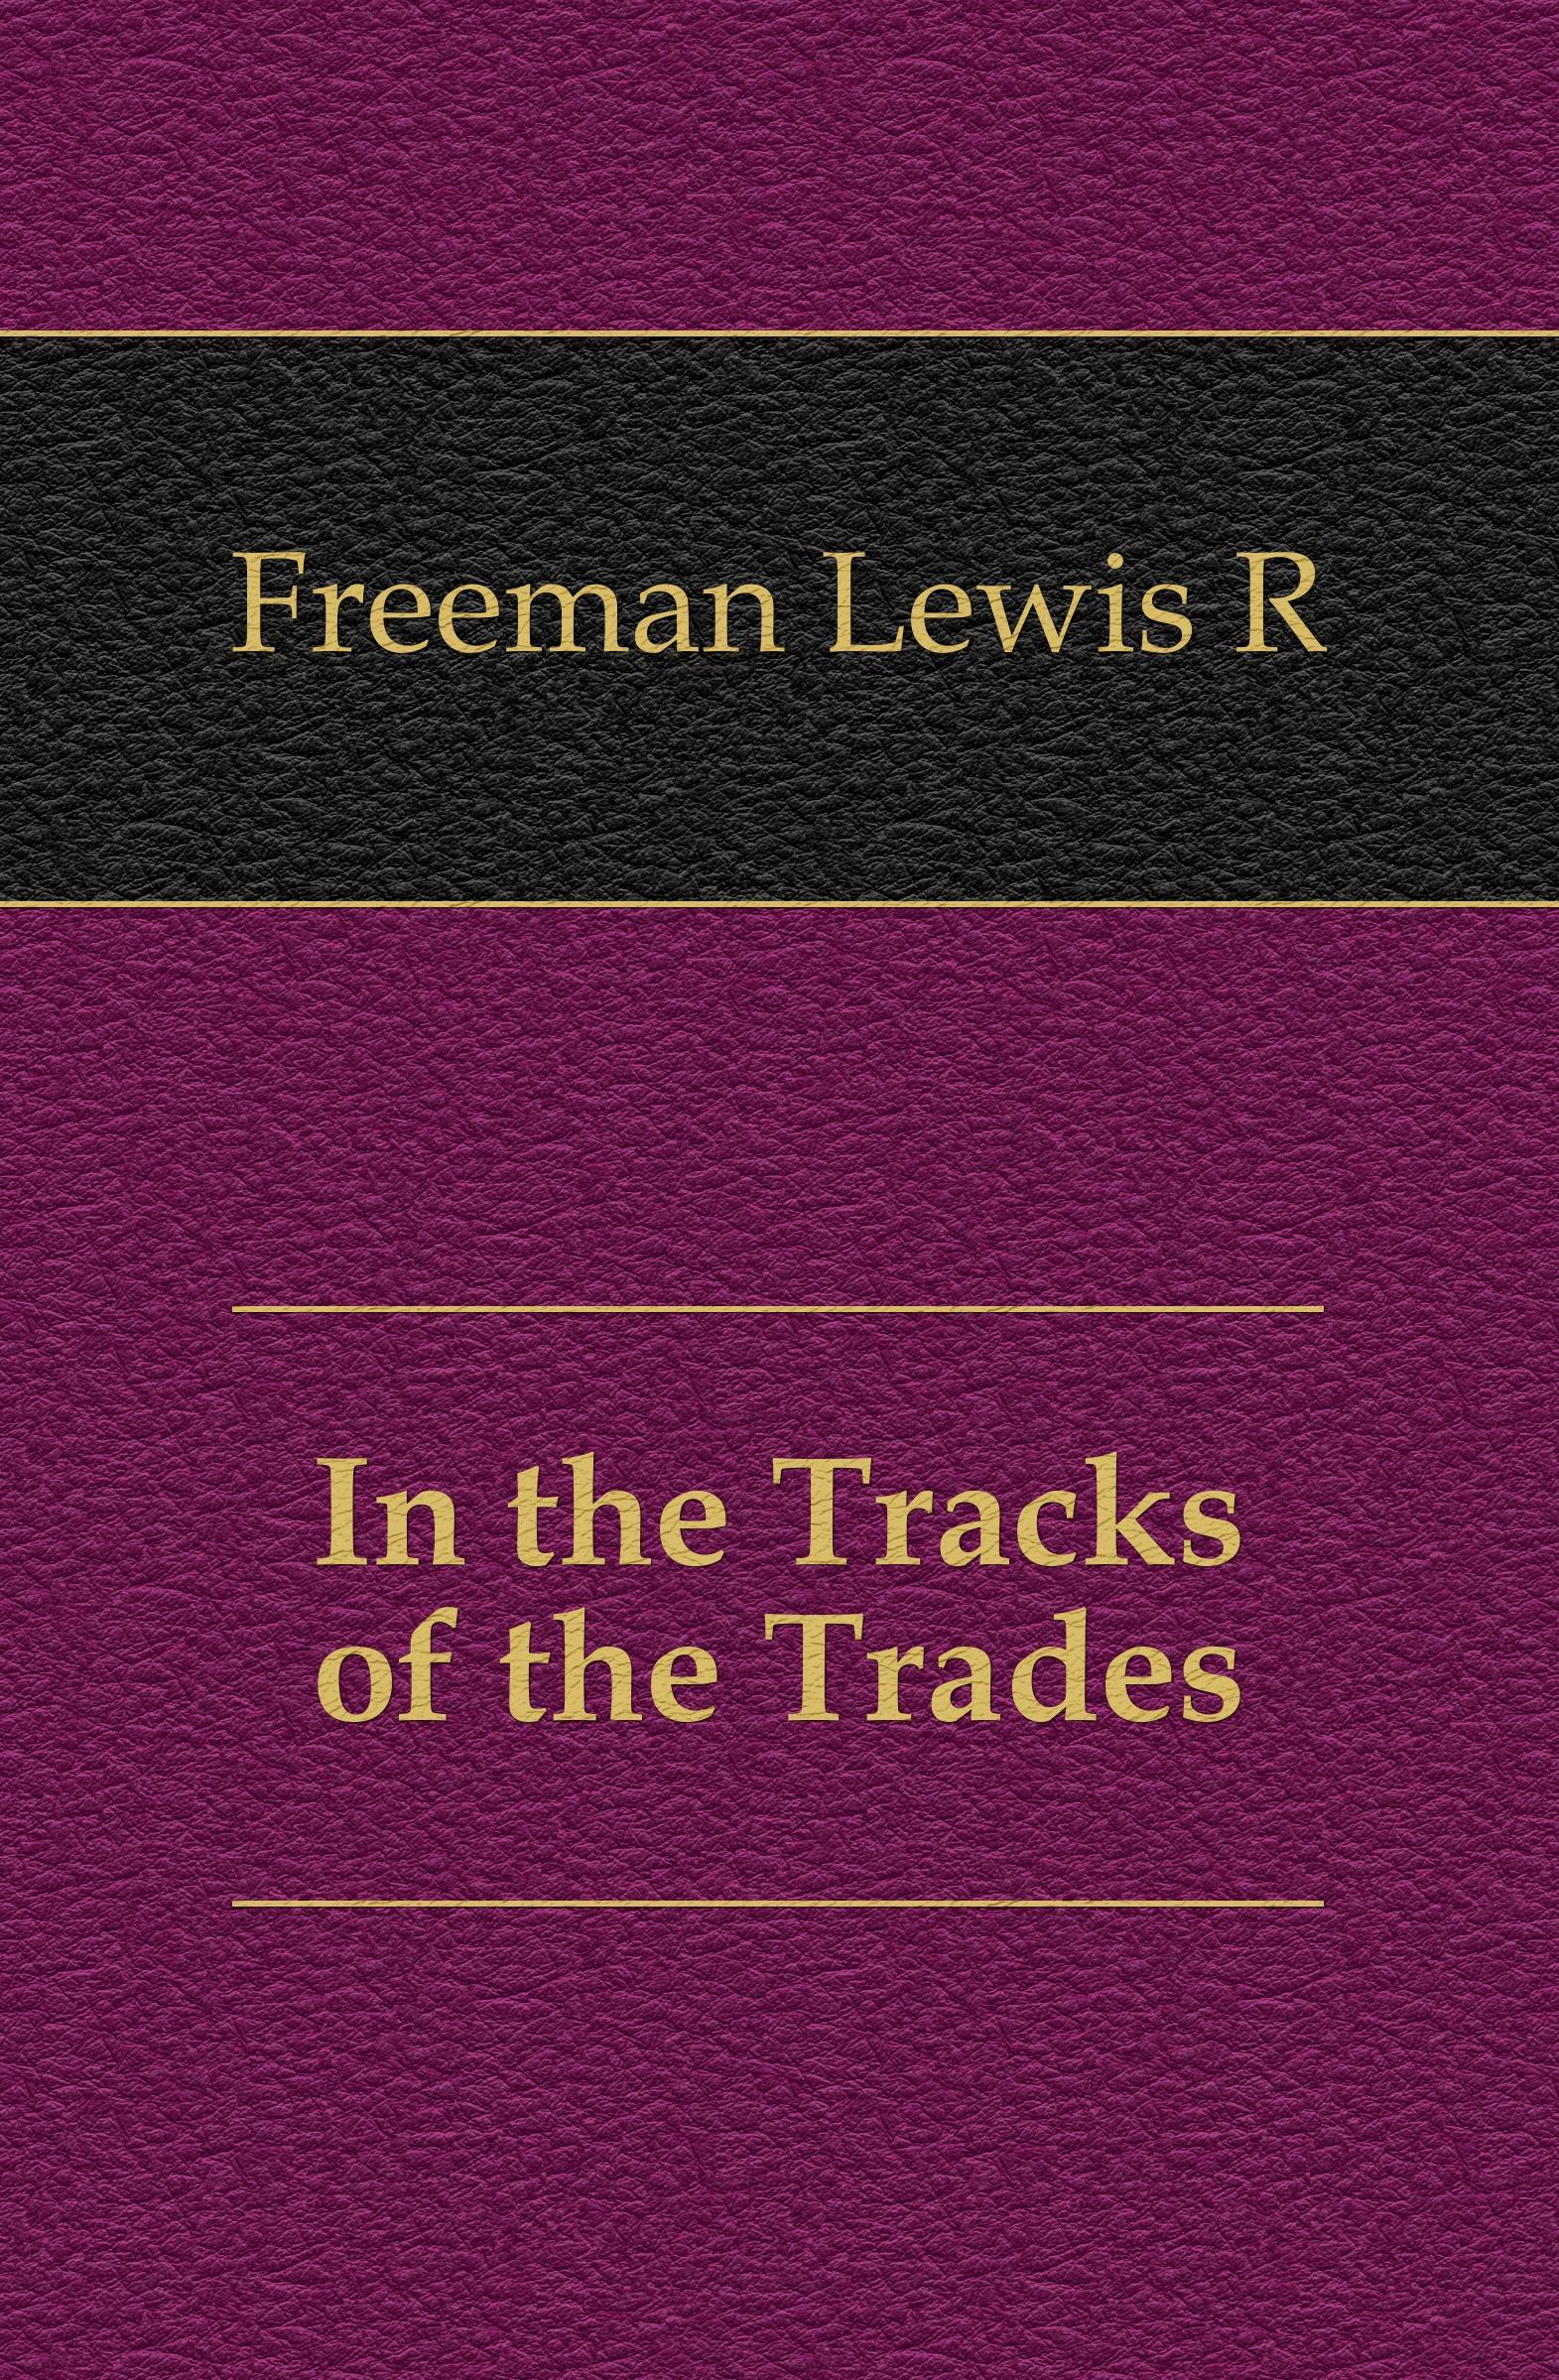 Freeman Lewis R. In the Tracks of the Trades r austin freeman osirise silm